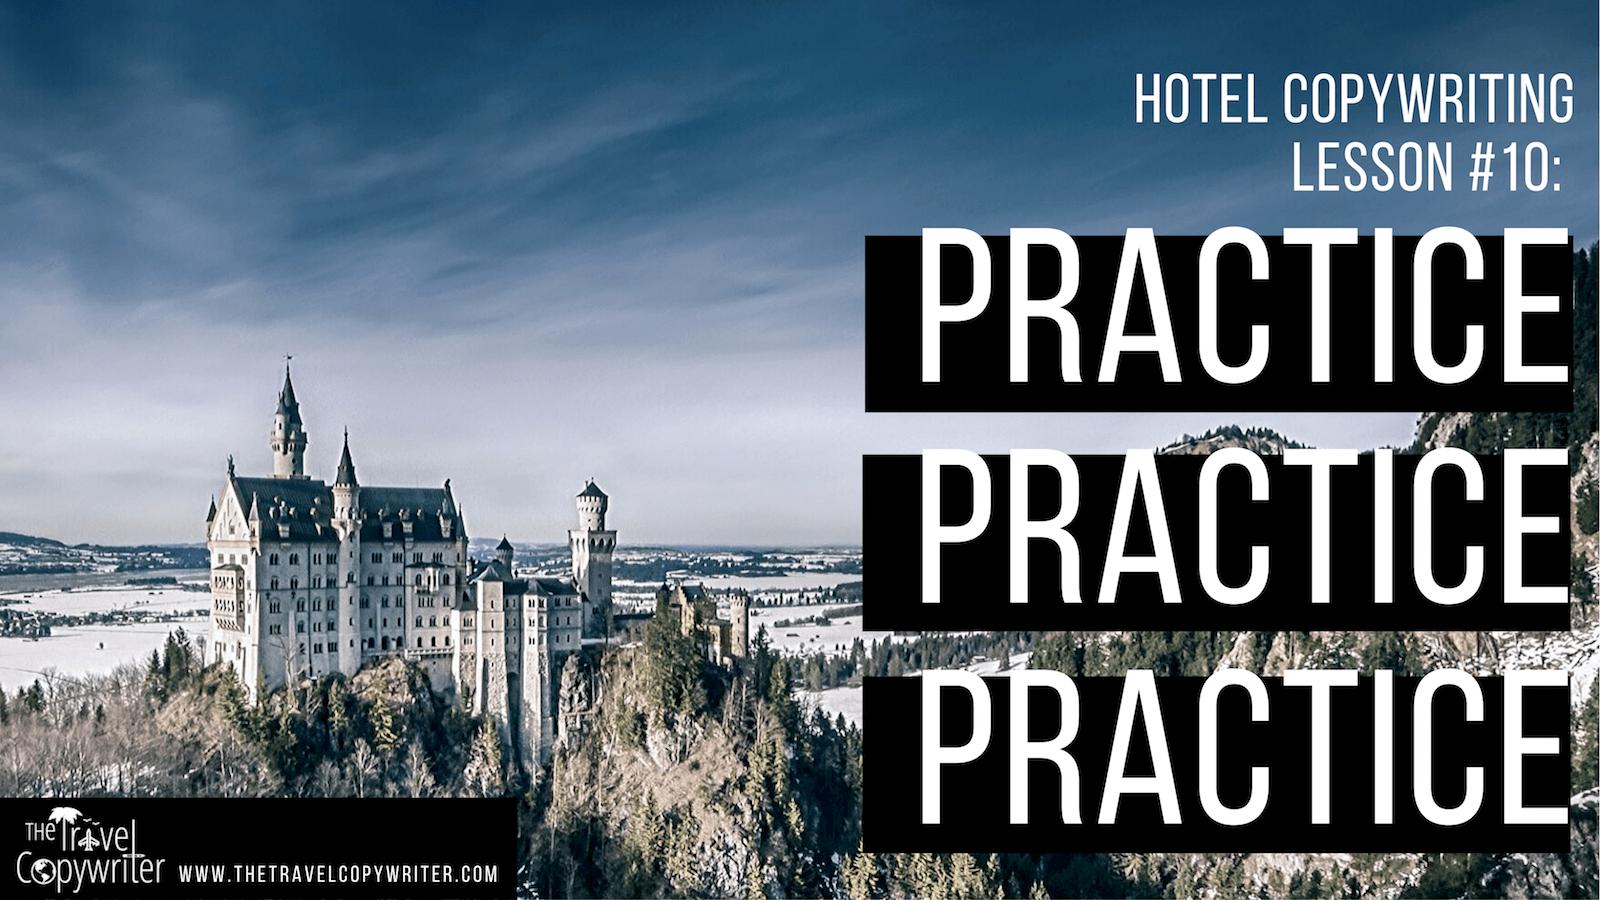 Hotel Copywriting Lesson 10 Practice, Practice, Practice